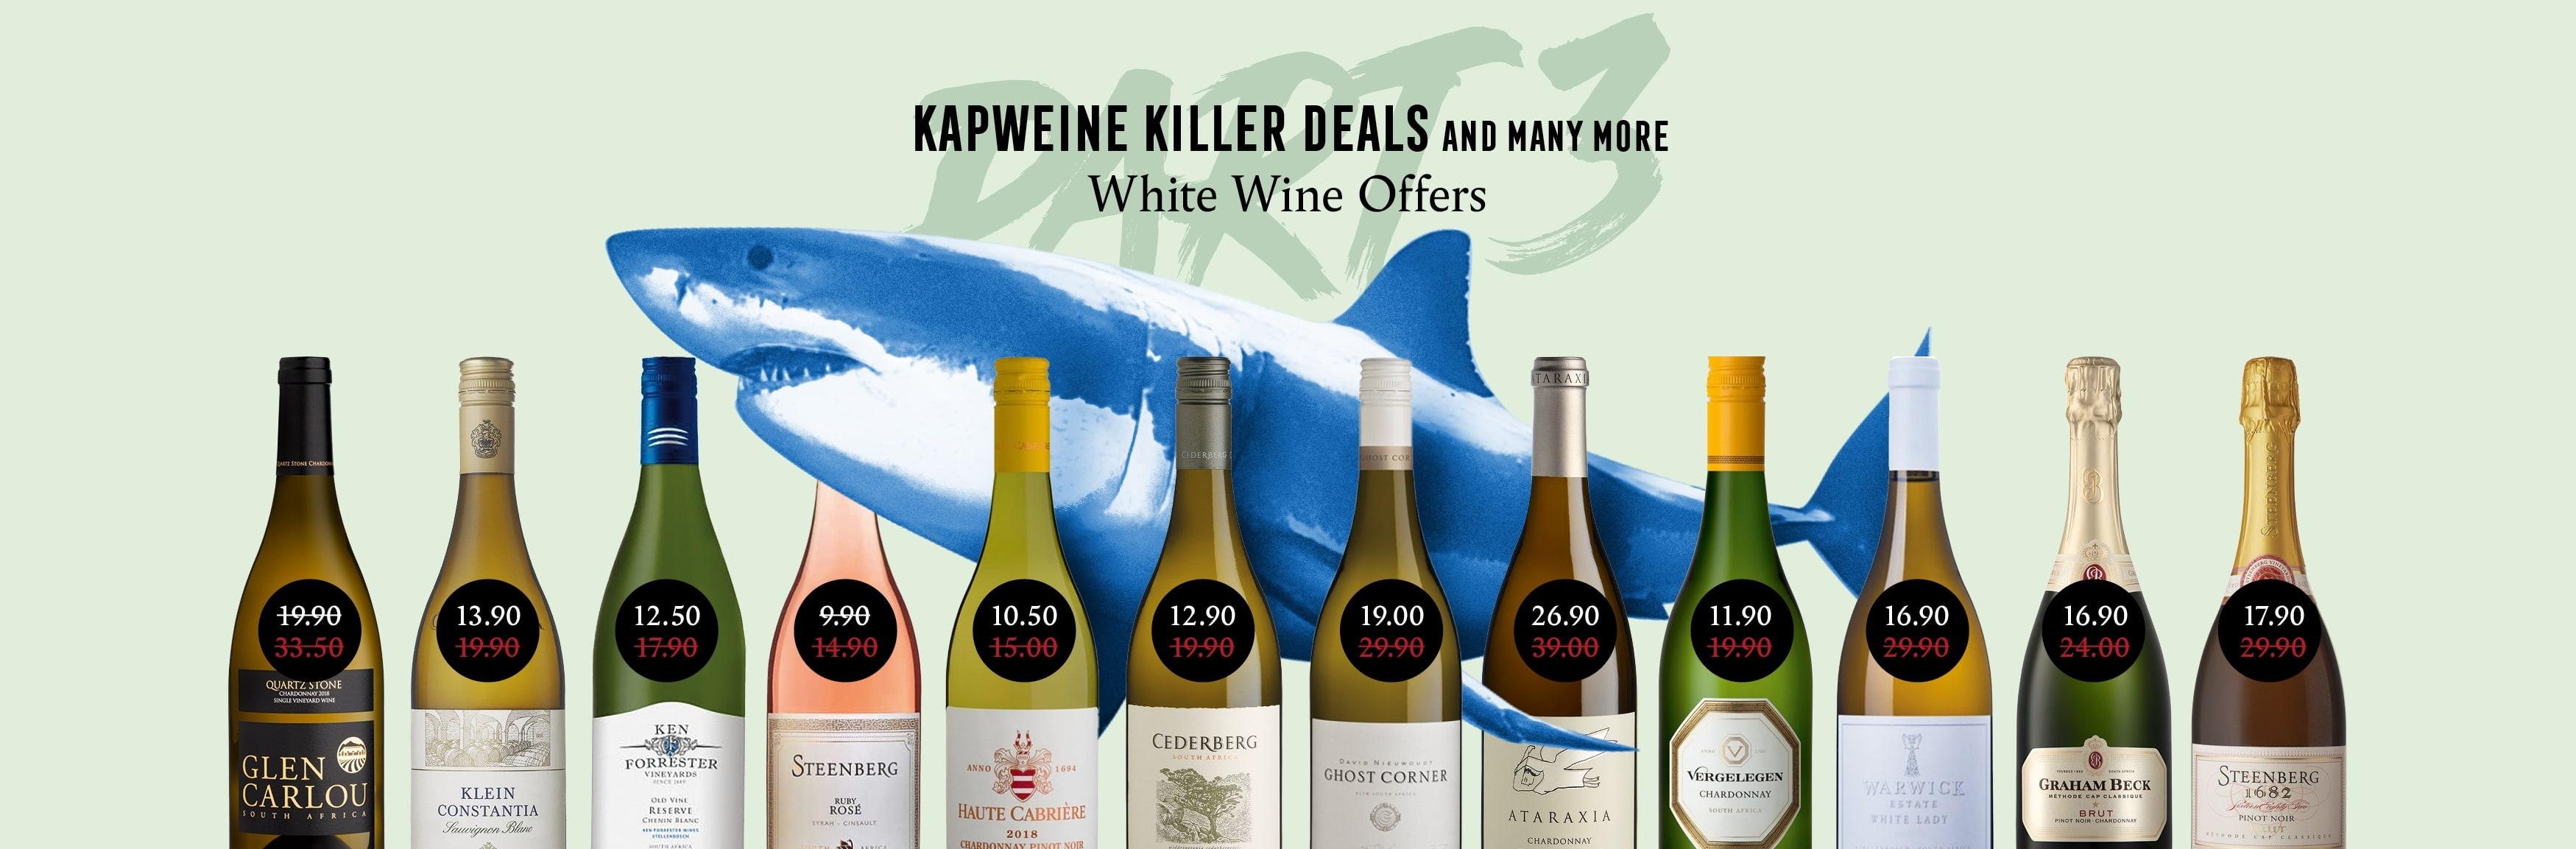 Killer Deals Part 3 White